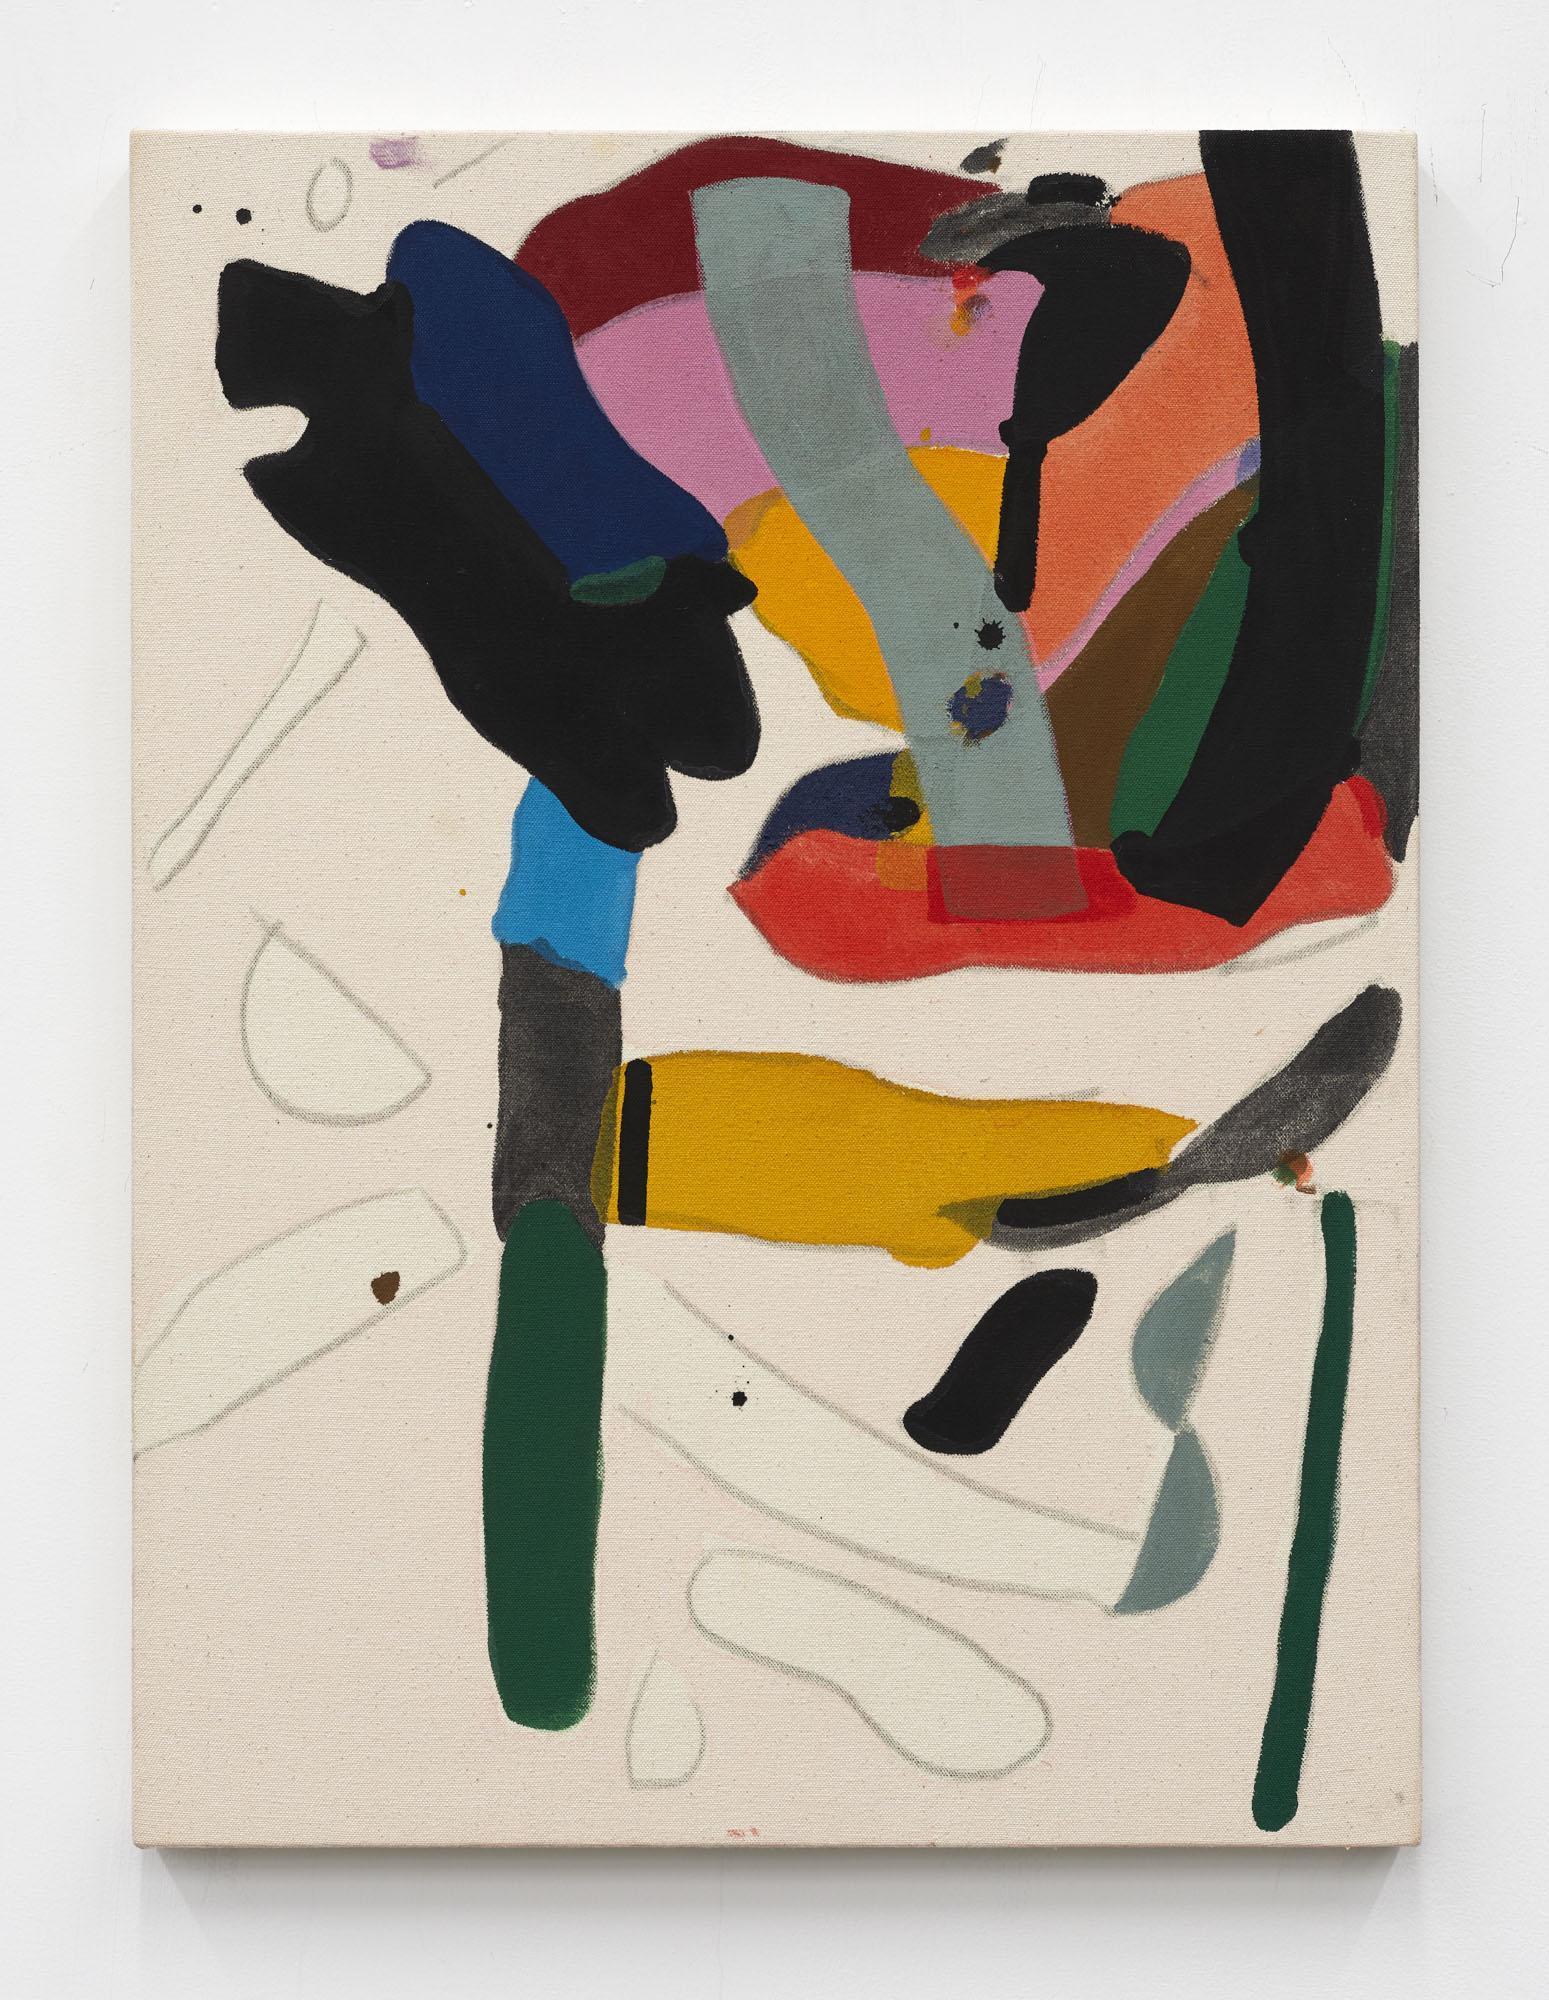 Matt Connors,/Untitled/, 2020, acrylic on canvas, 60.96 × 60.96 cm